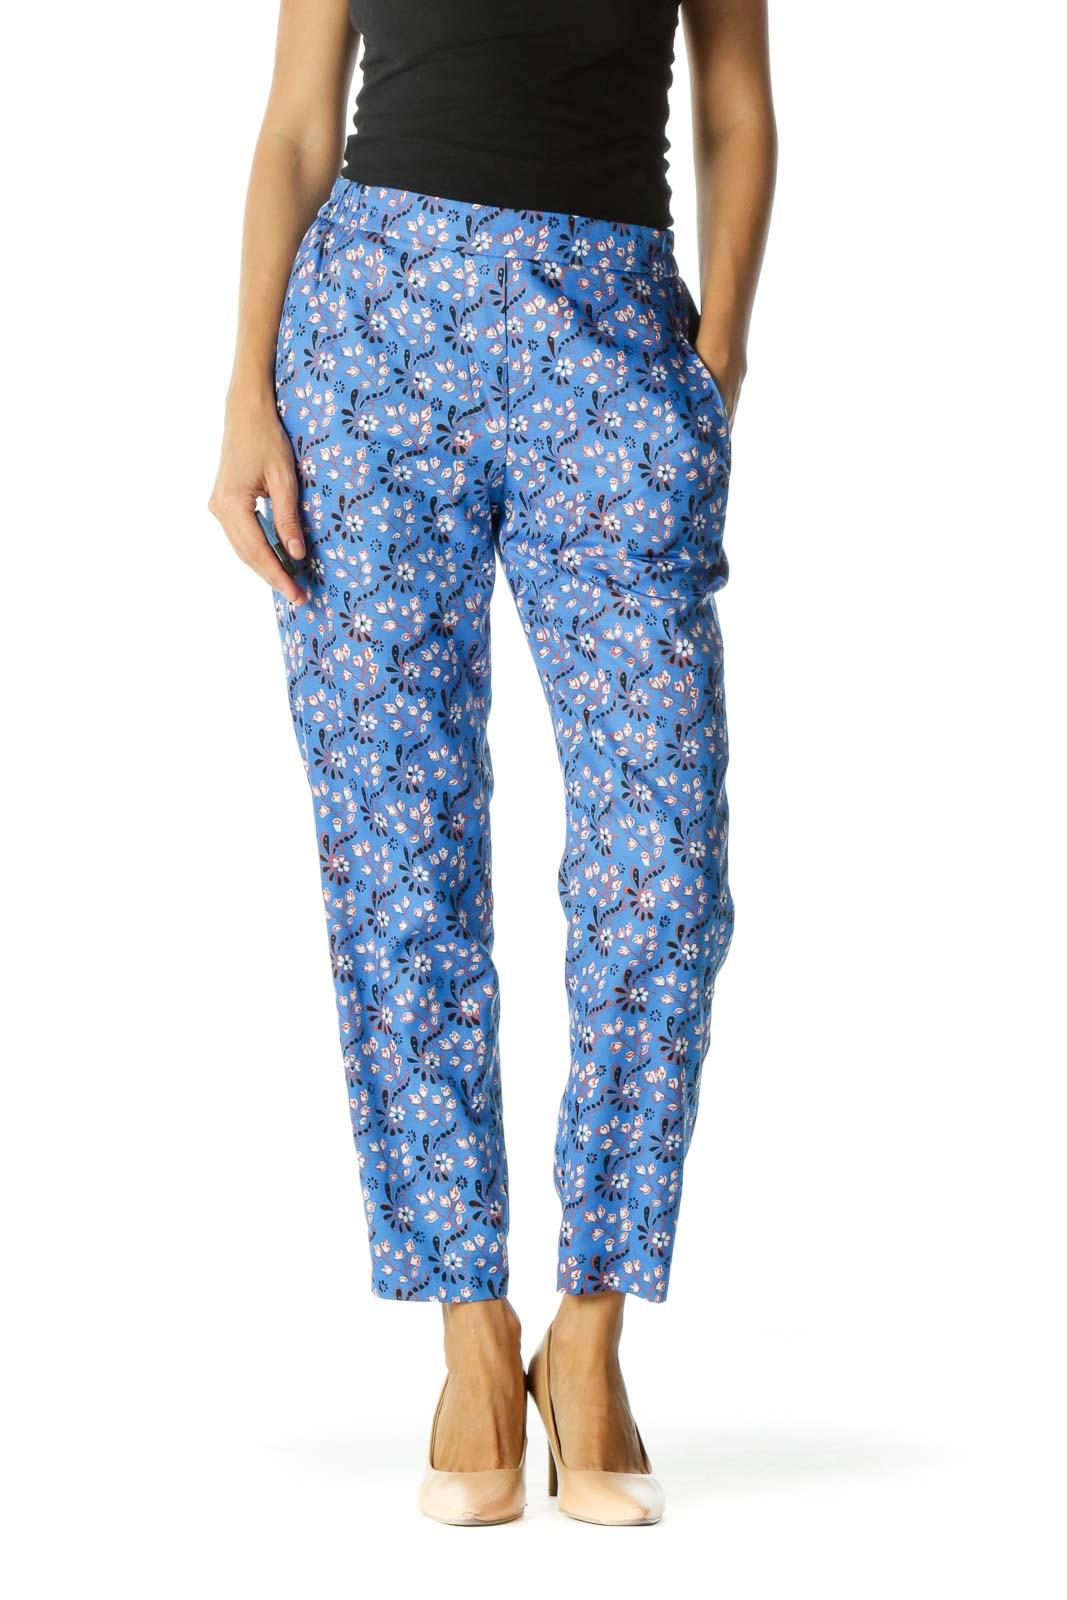 Blue Floral Print Elastic Waist Pant